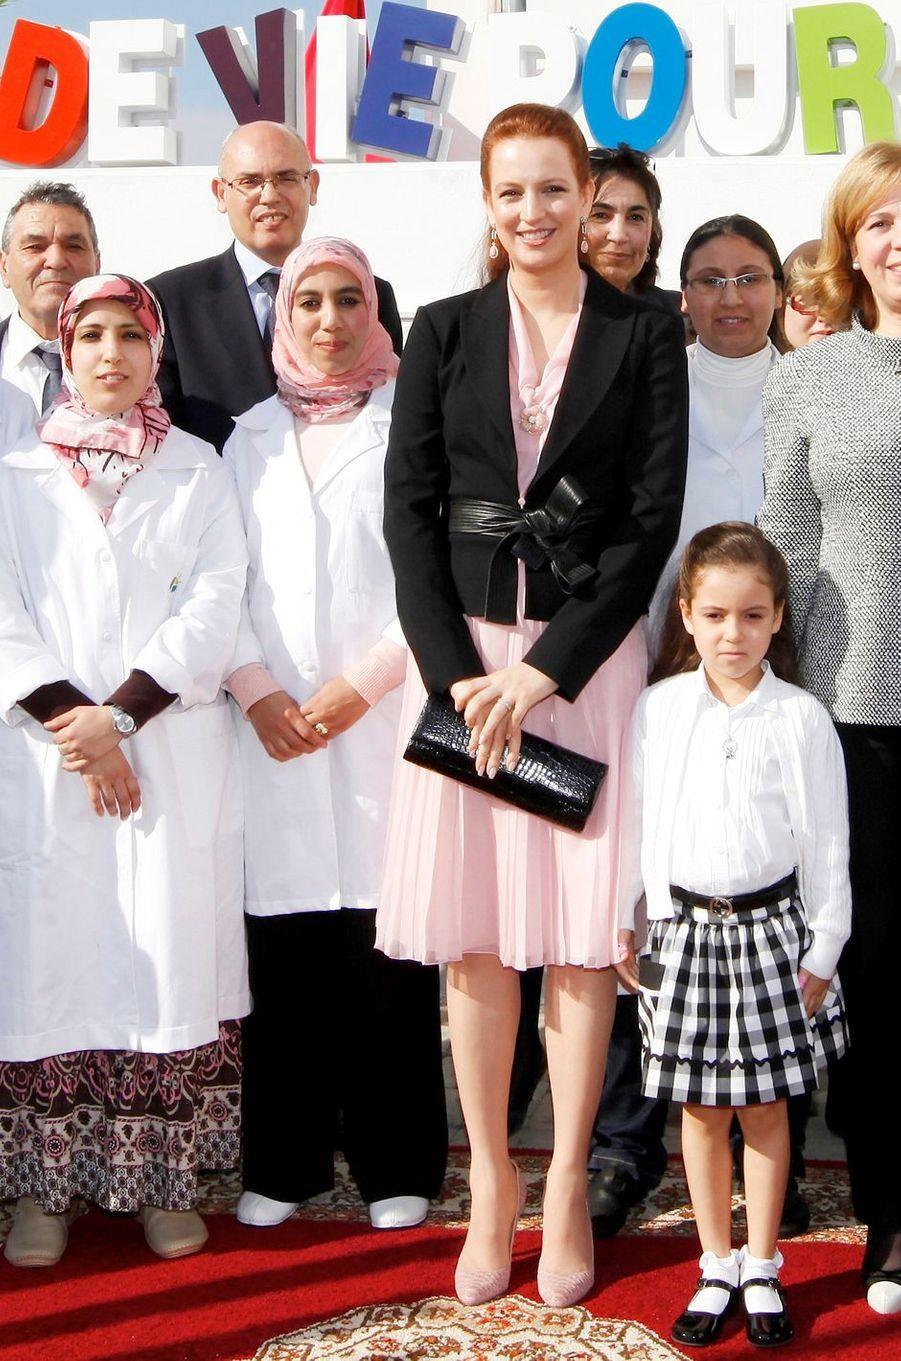 La princesse Lalla Khadija du Maroc avec sa mère la princesse Lalla Salma, le 1er février 2012